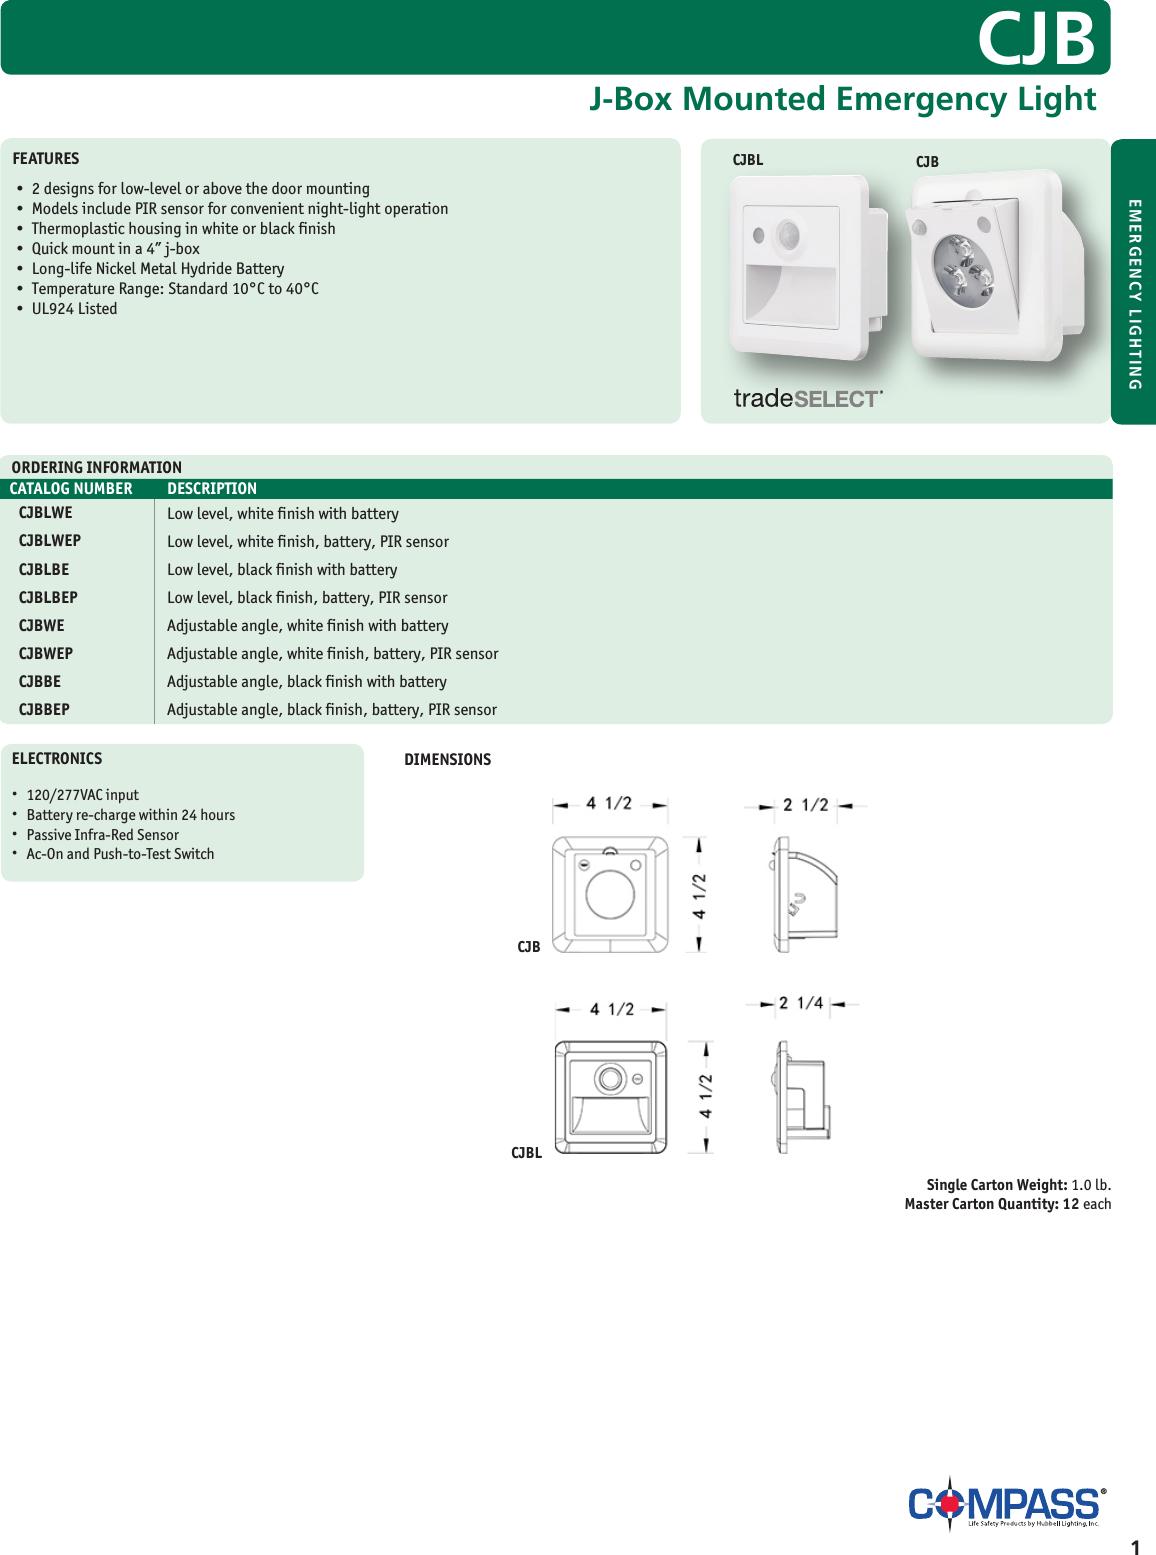 Black Finish Compass CJBBE CJB Adjustable Angle with Battery